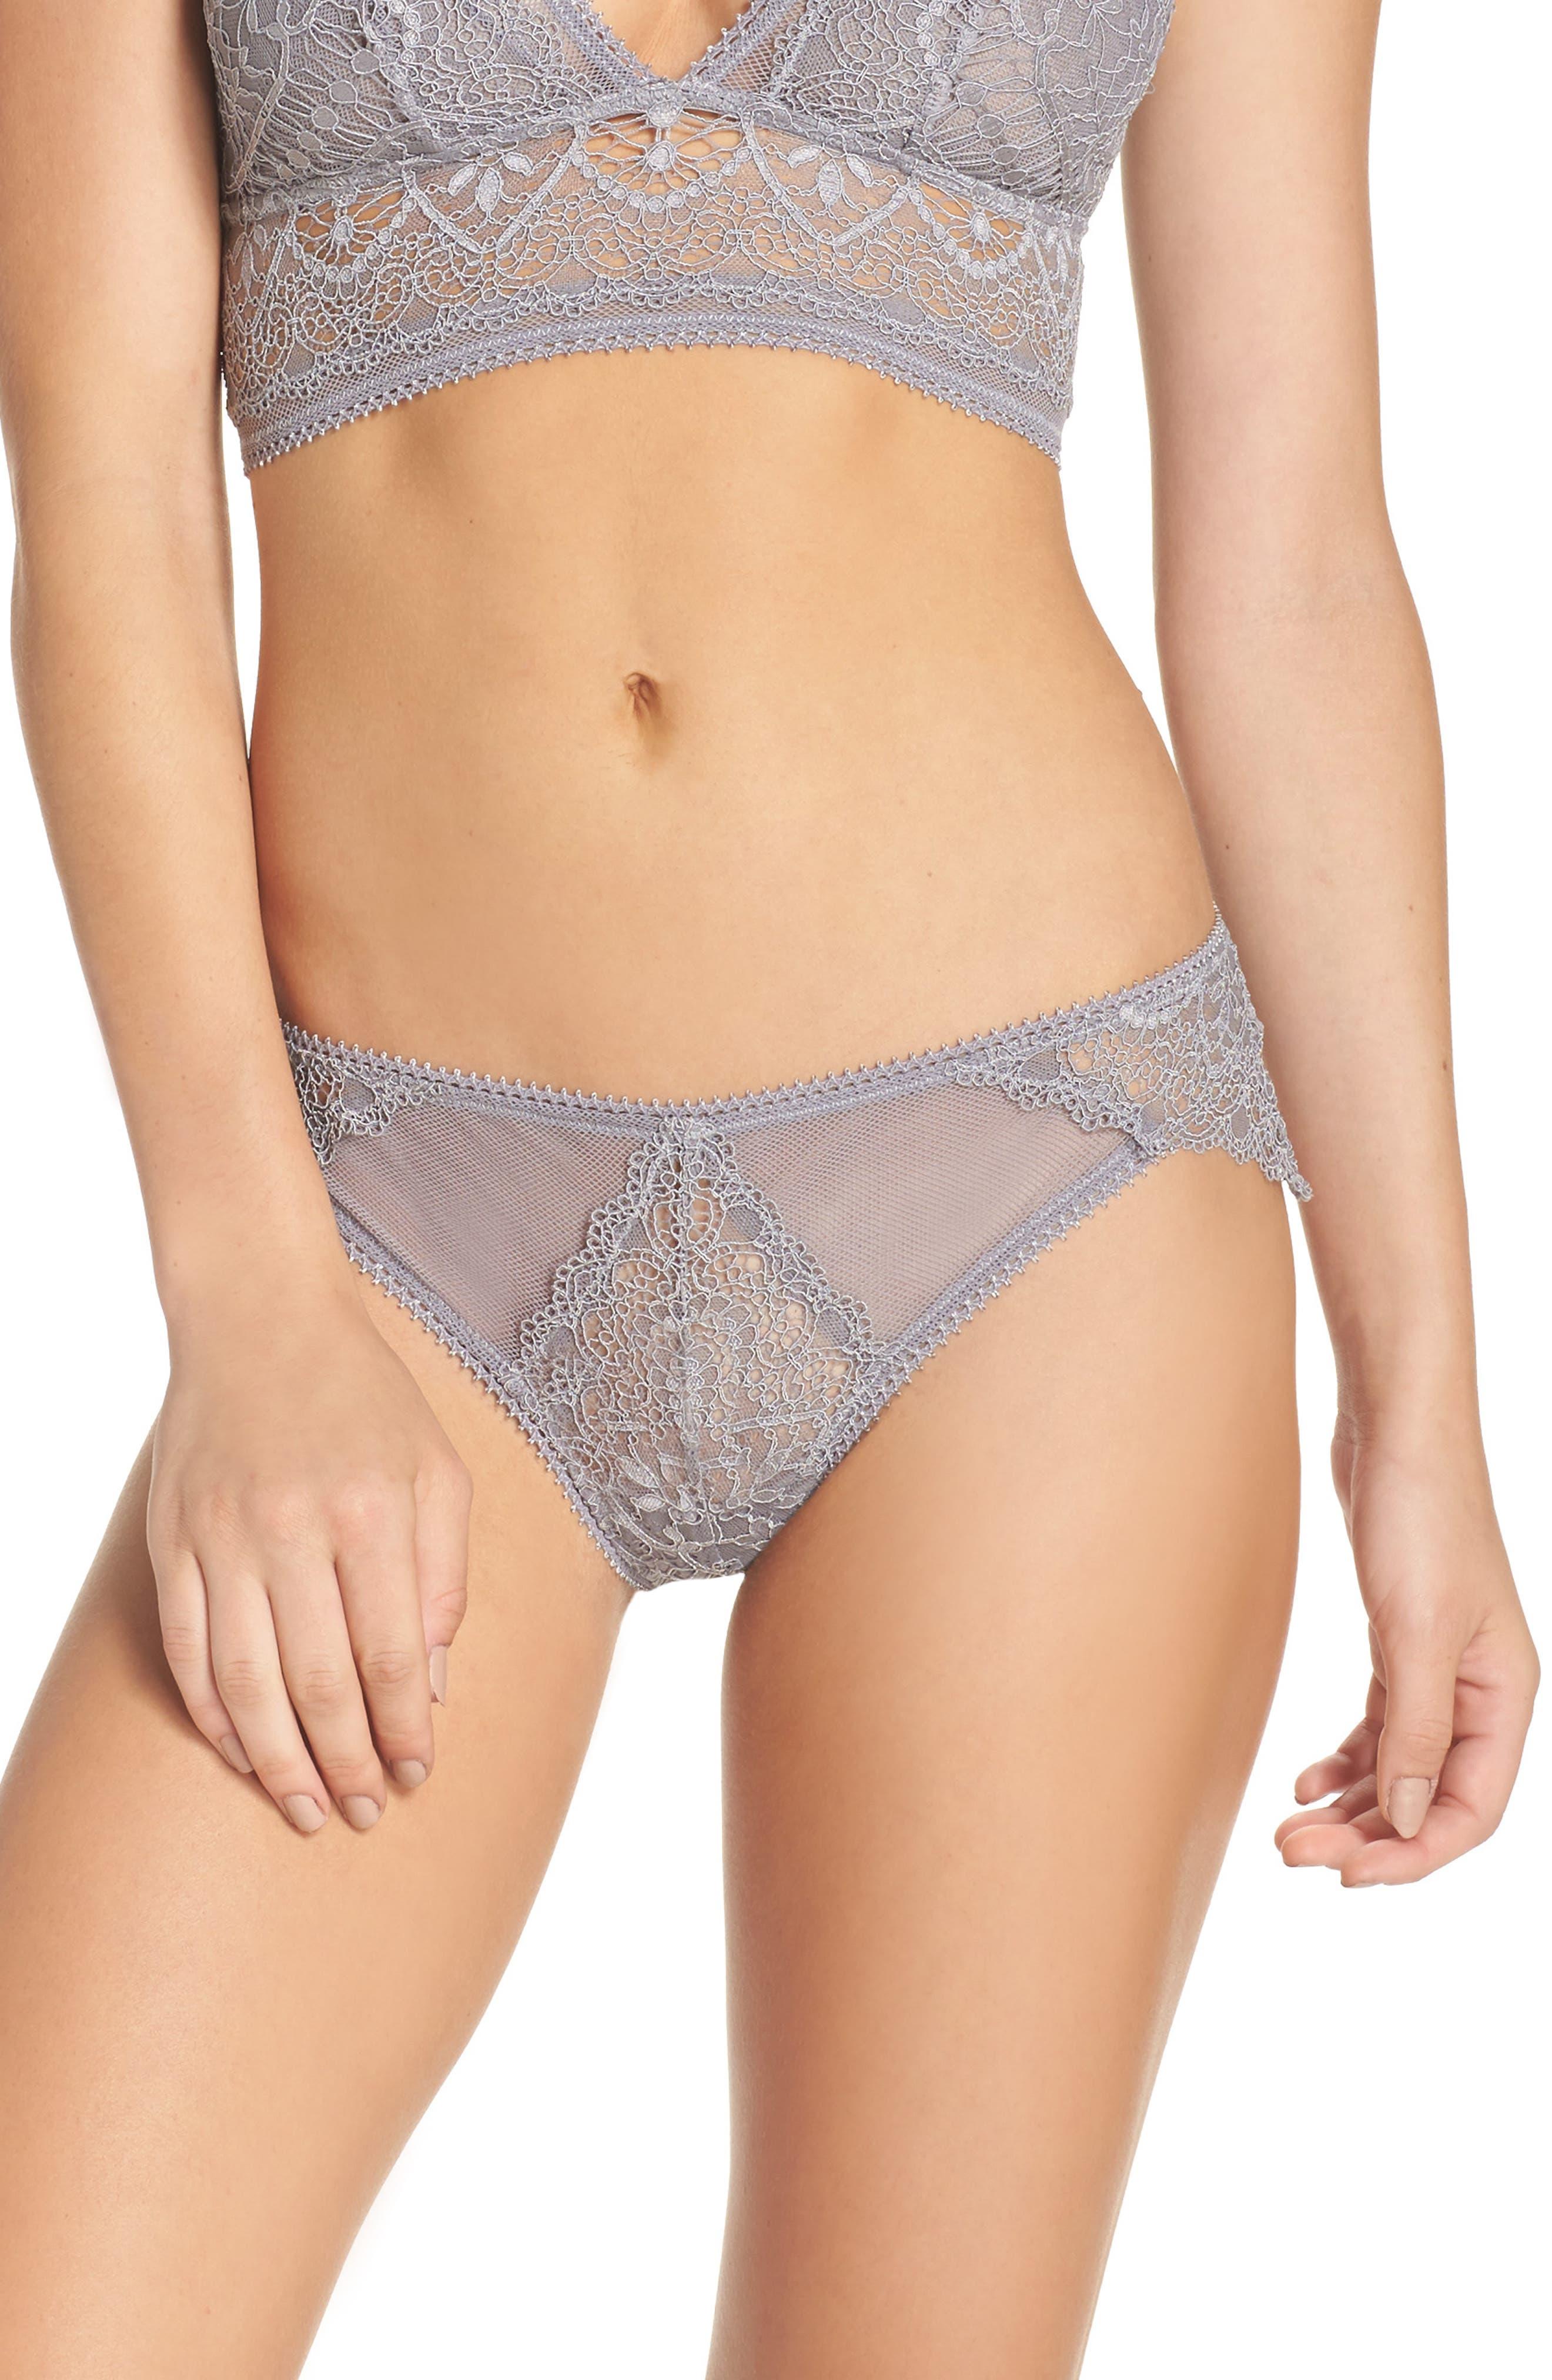 Honeydew Intimates Lace Hipster Panties